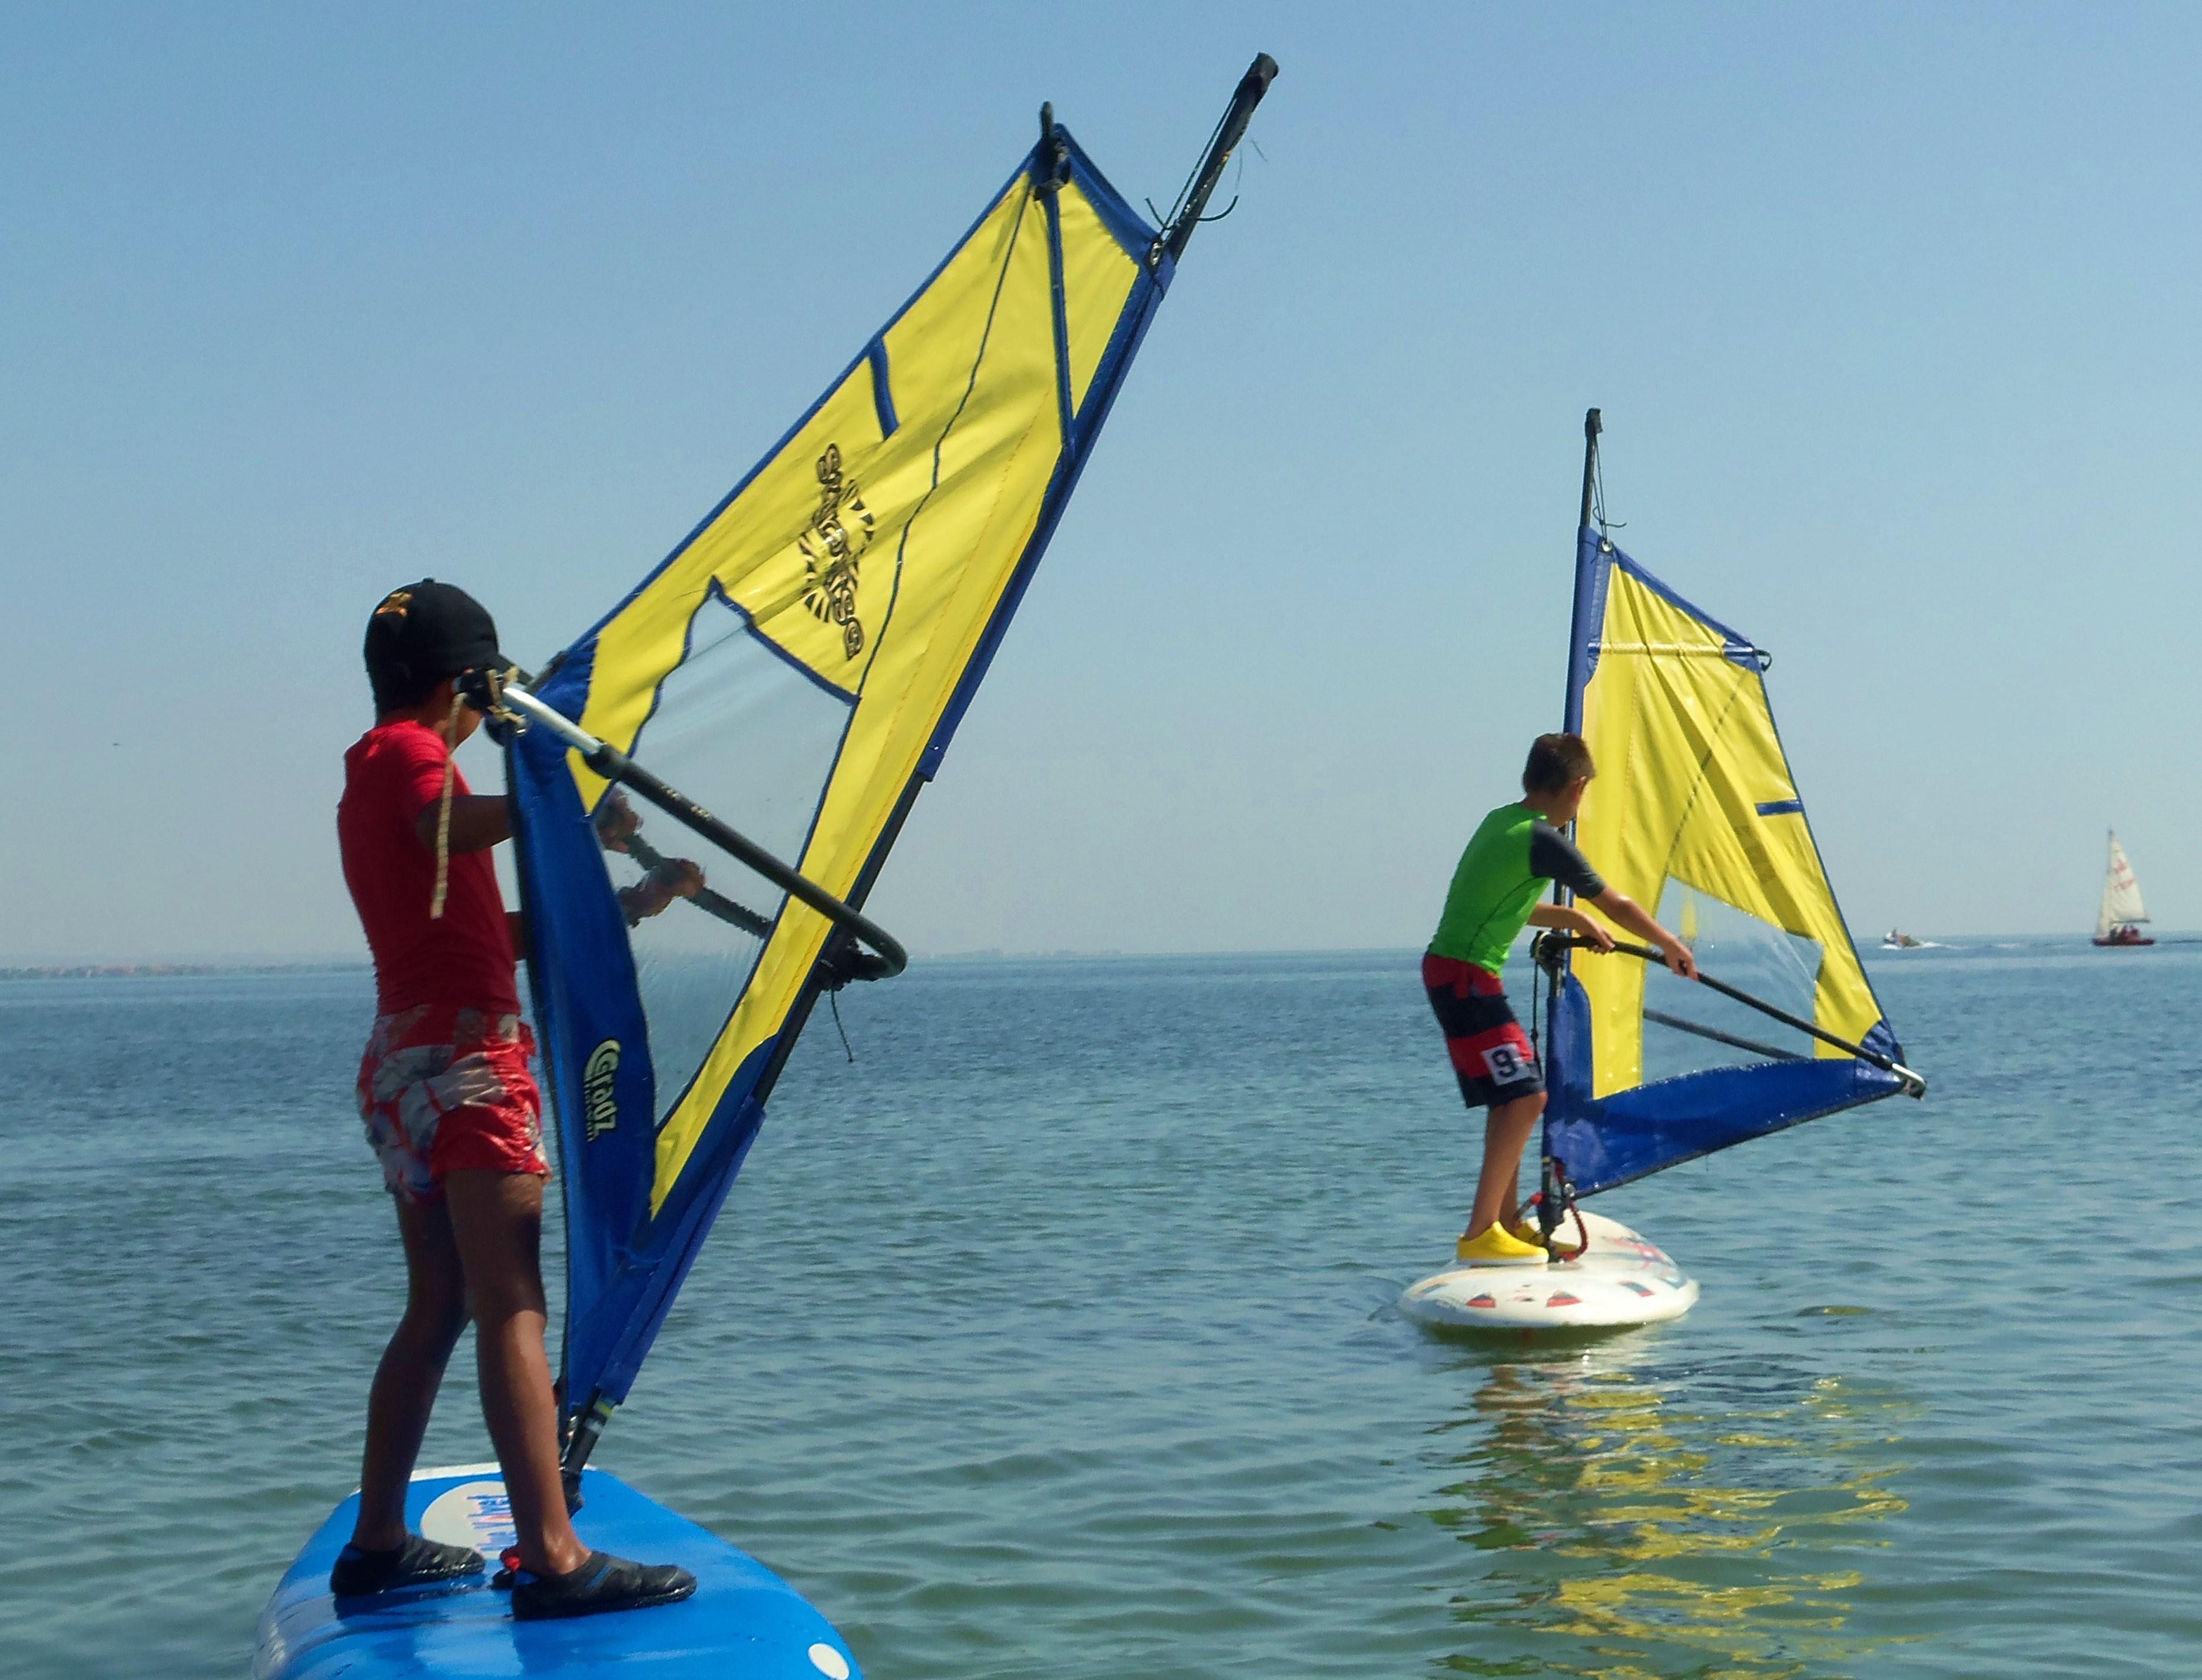 windsurf7 (2).jpg